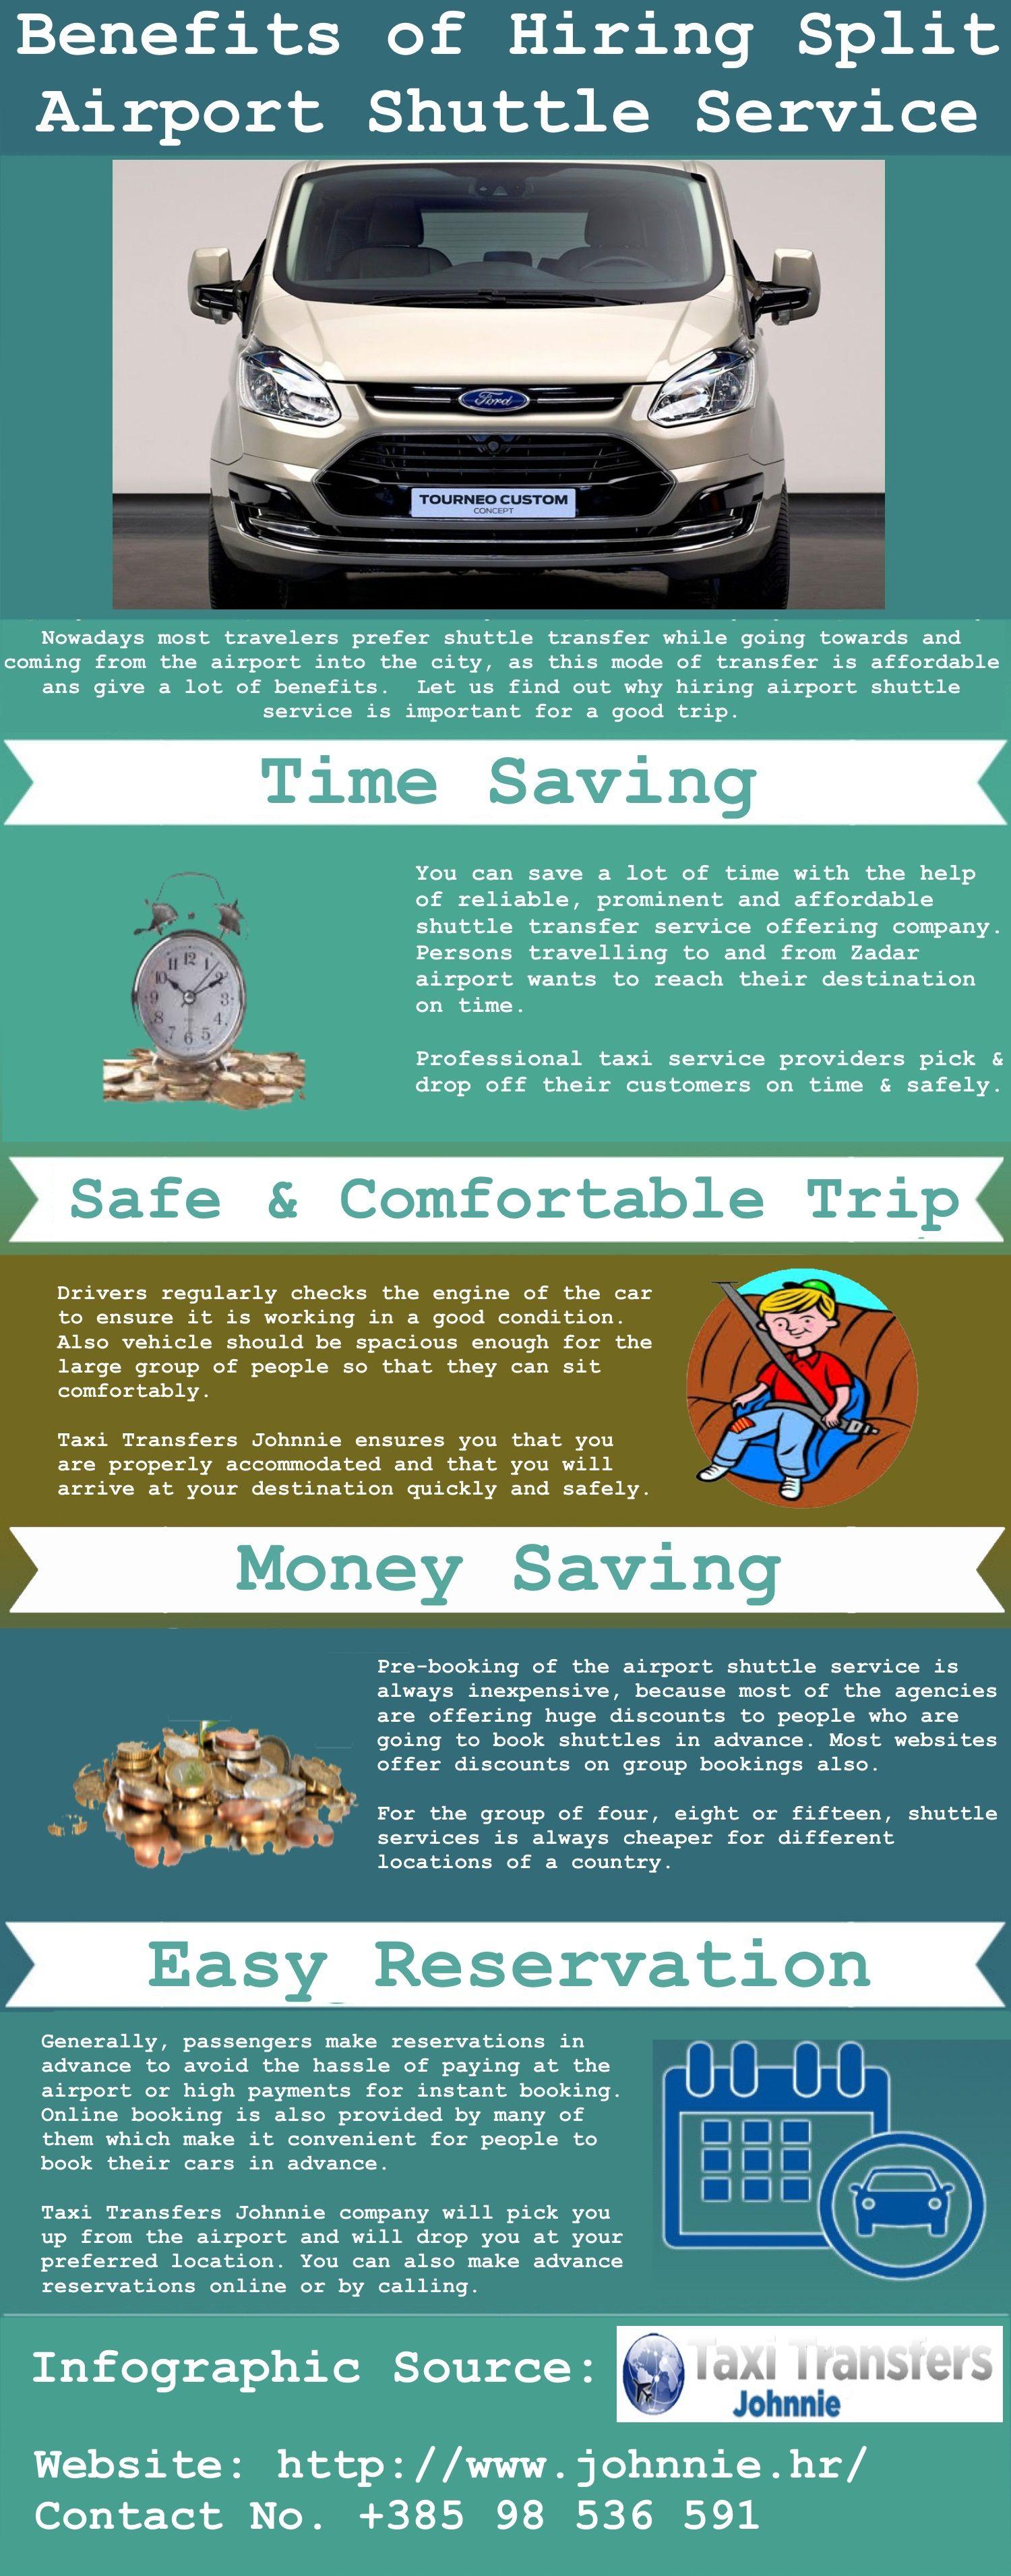 Benefits Of Hiring Split Airport Shuttle Service Airport Shuttle Shuttling Trip